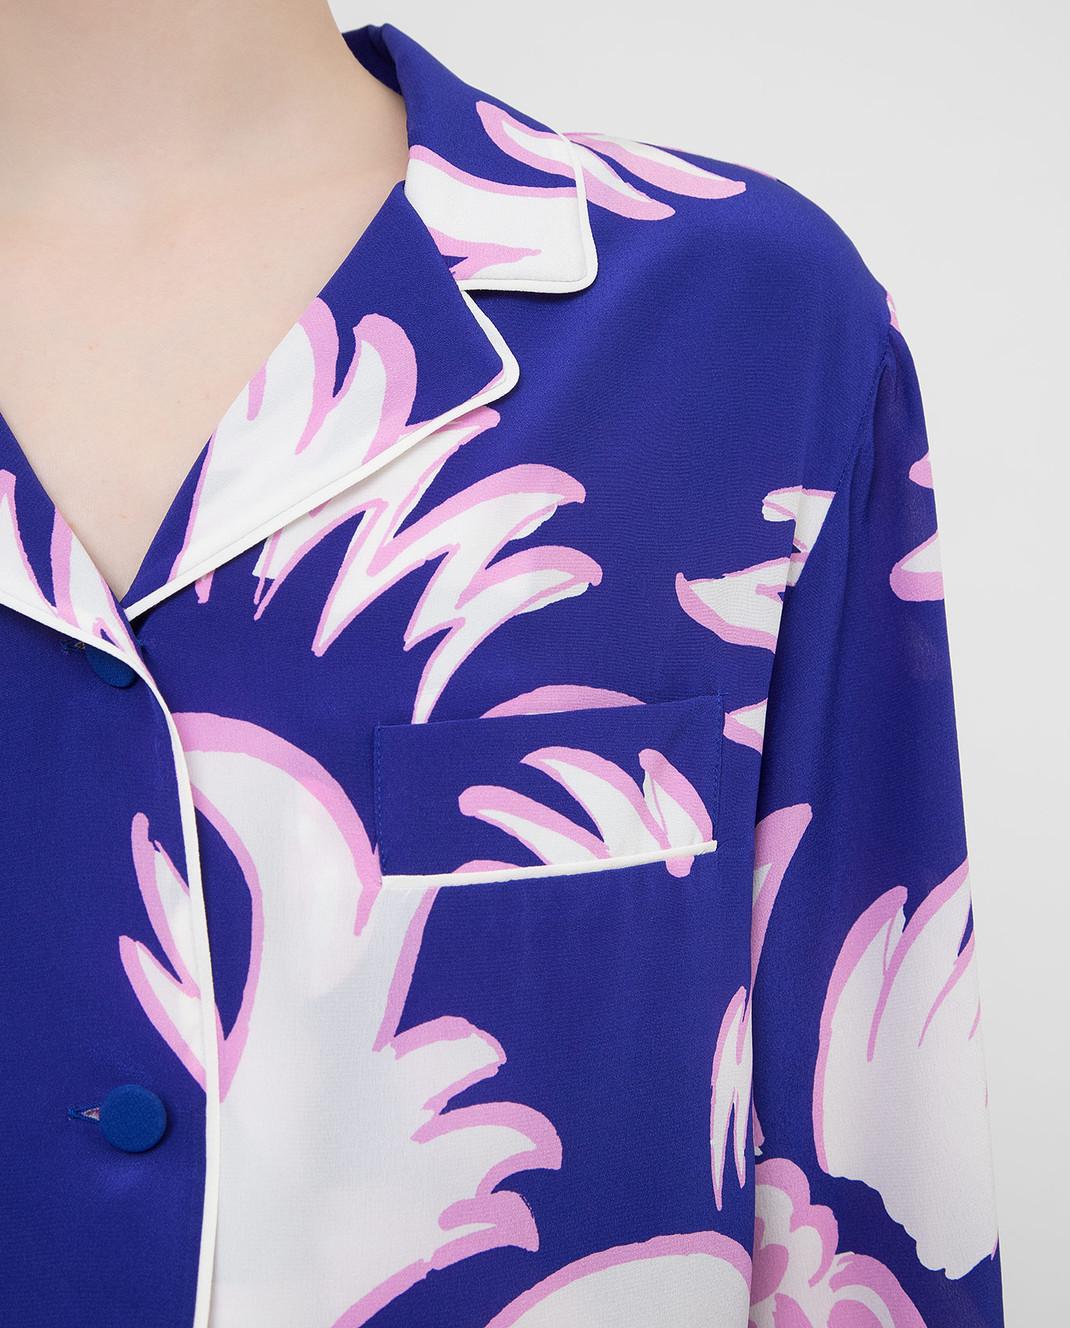 Valentino Фиолетовая блуза из шелка RB0AB0Y64HV изображение 5